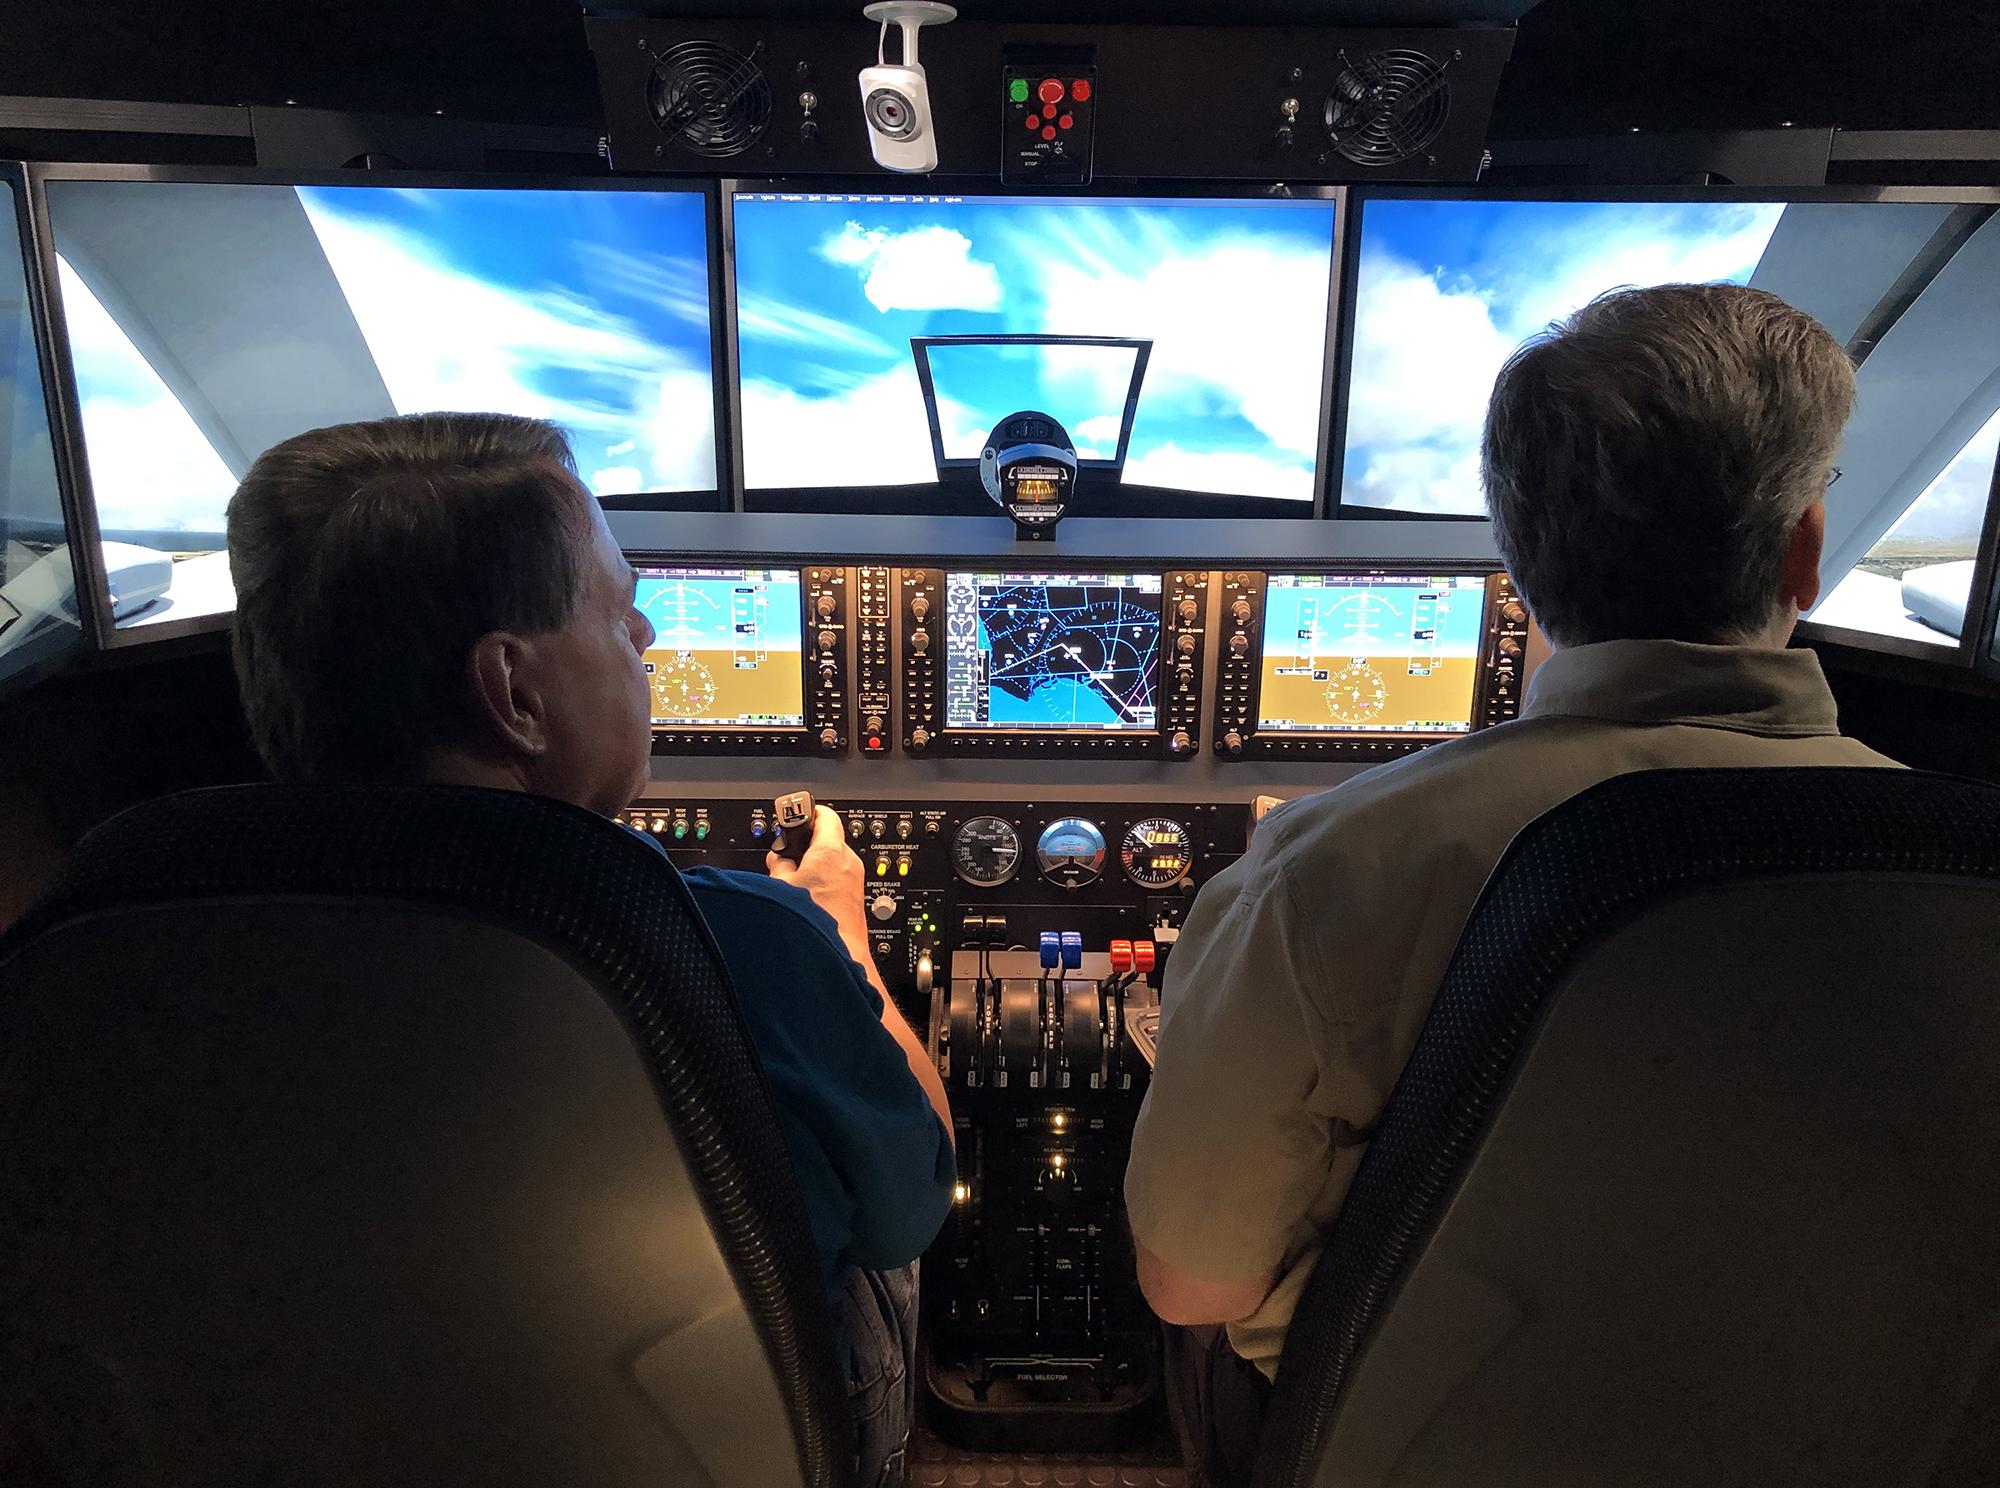 Aviation professors using flight simulator